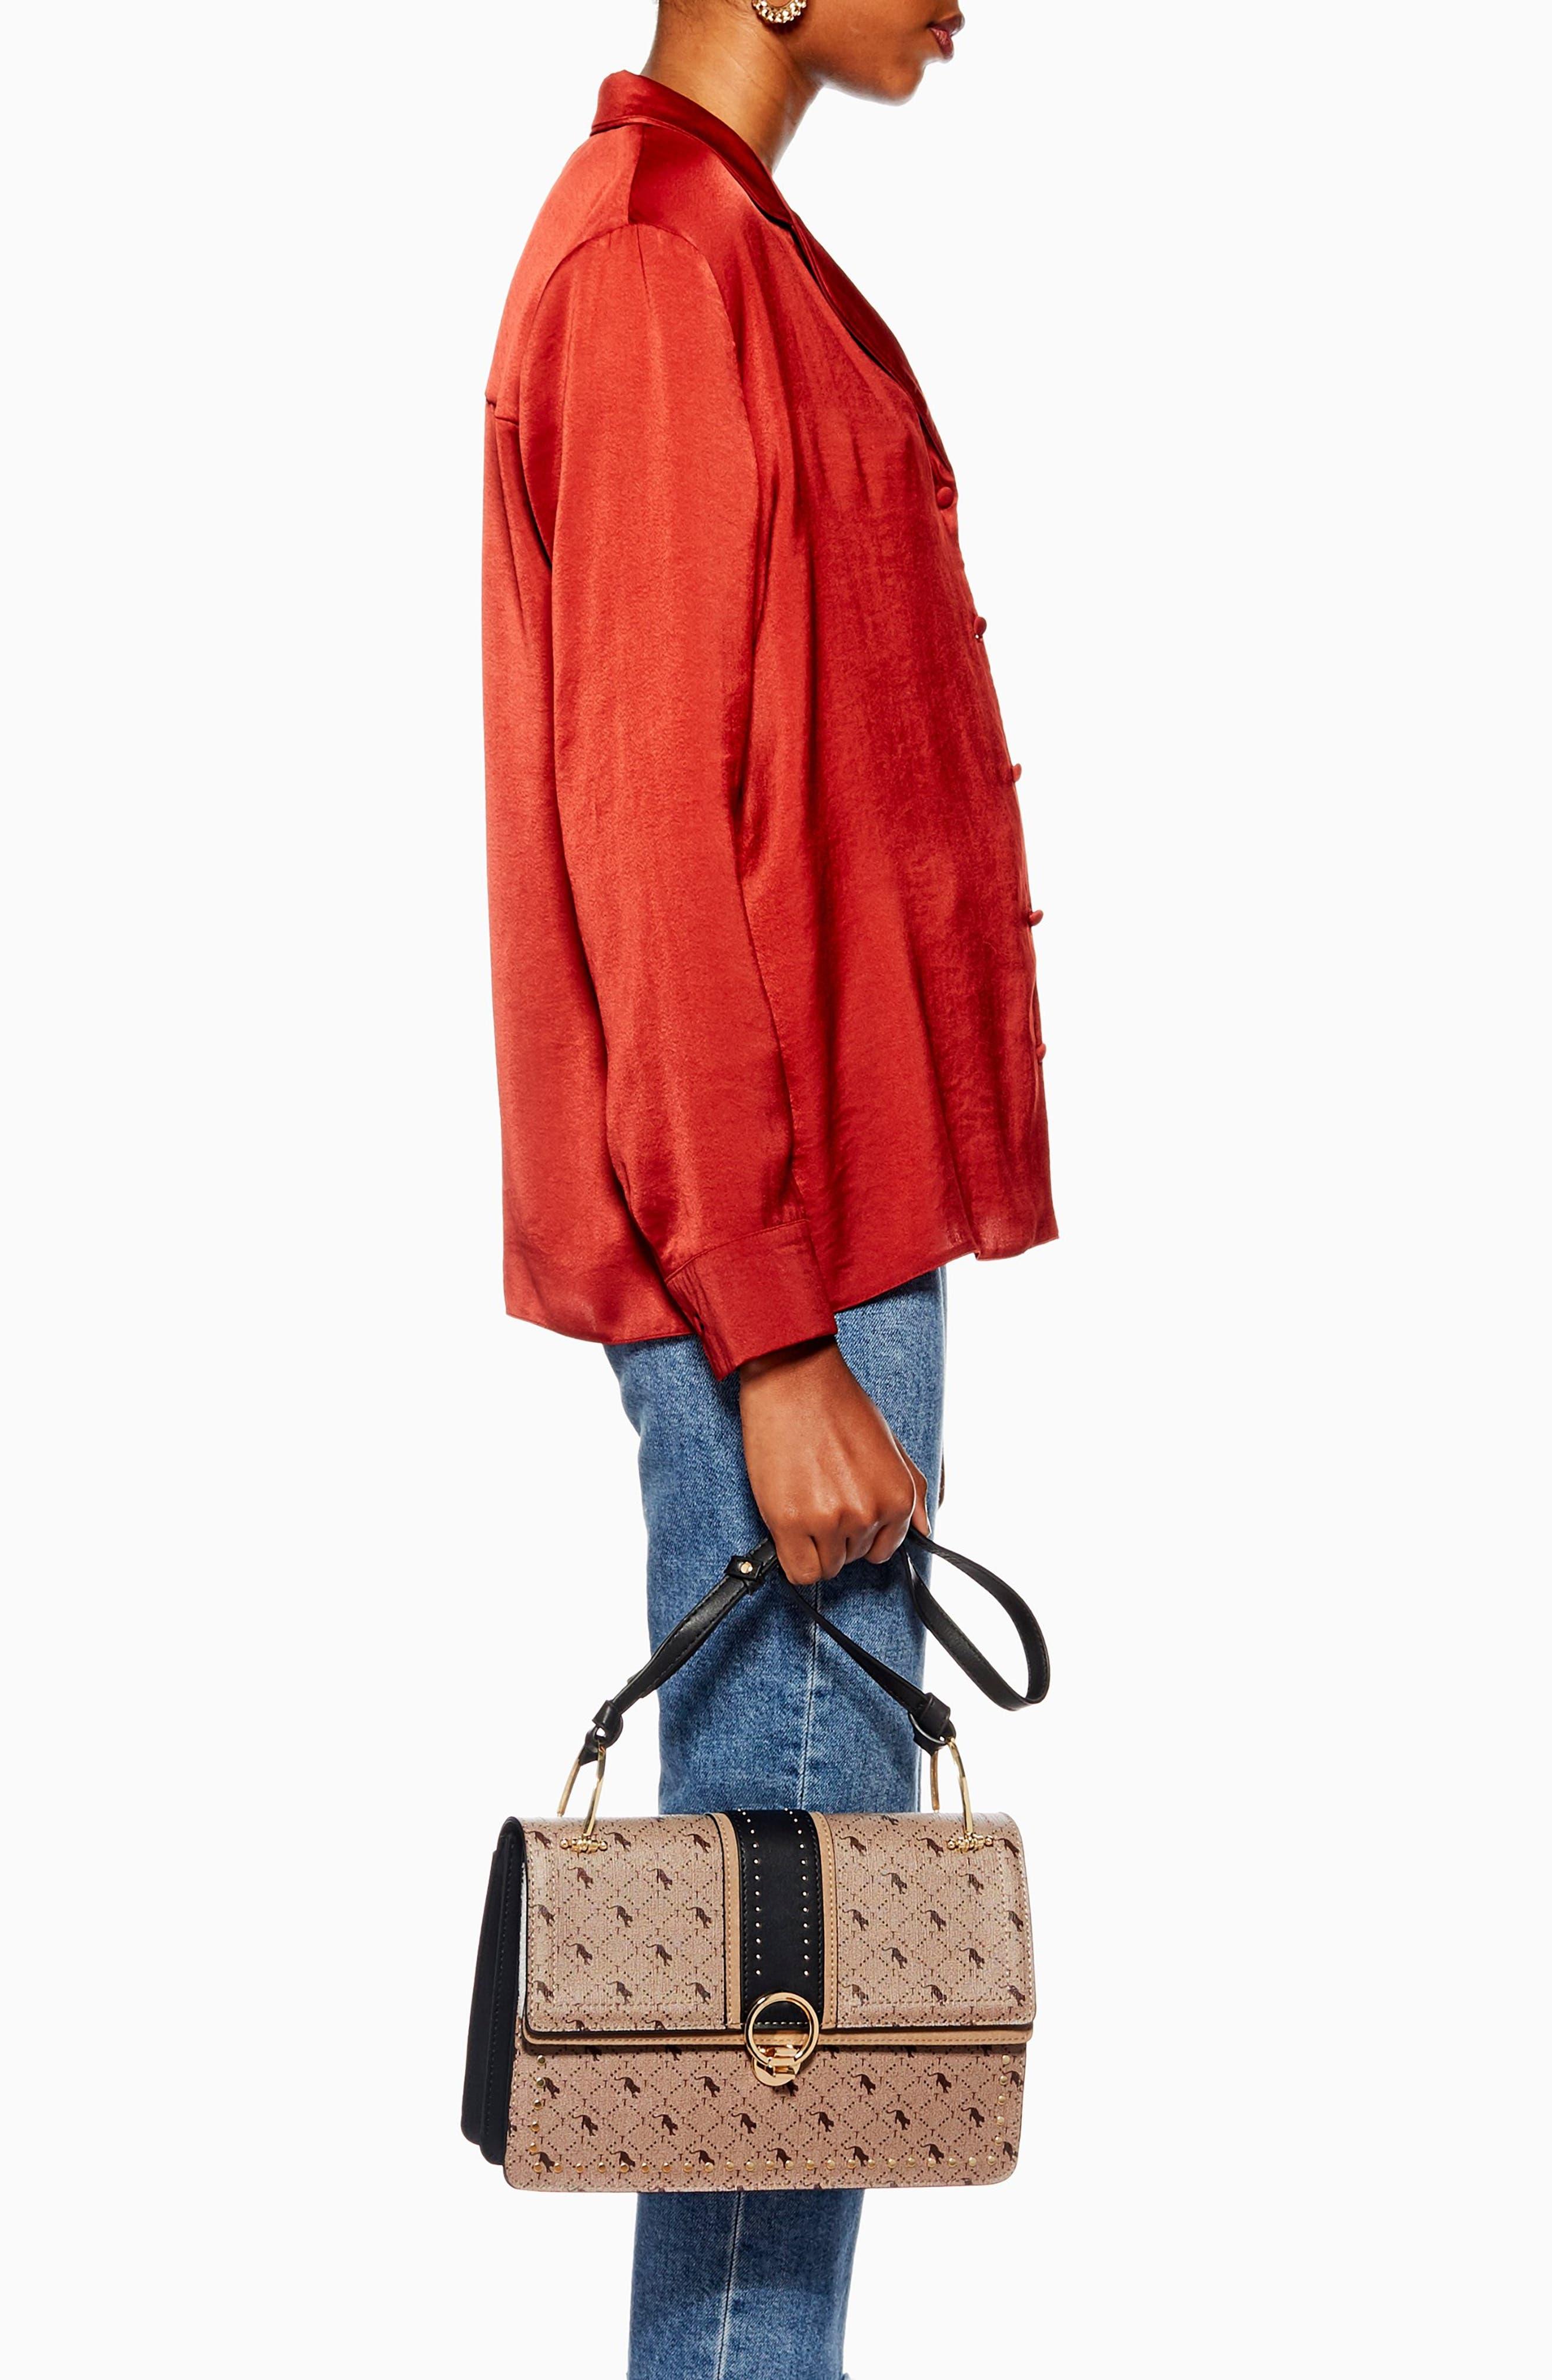 Madrid Studded Faux Leather Shoulder Bag,                             Alternate thumbnail 5, color,                             TAUPE MULTI